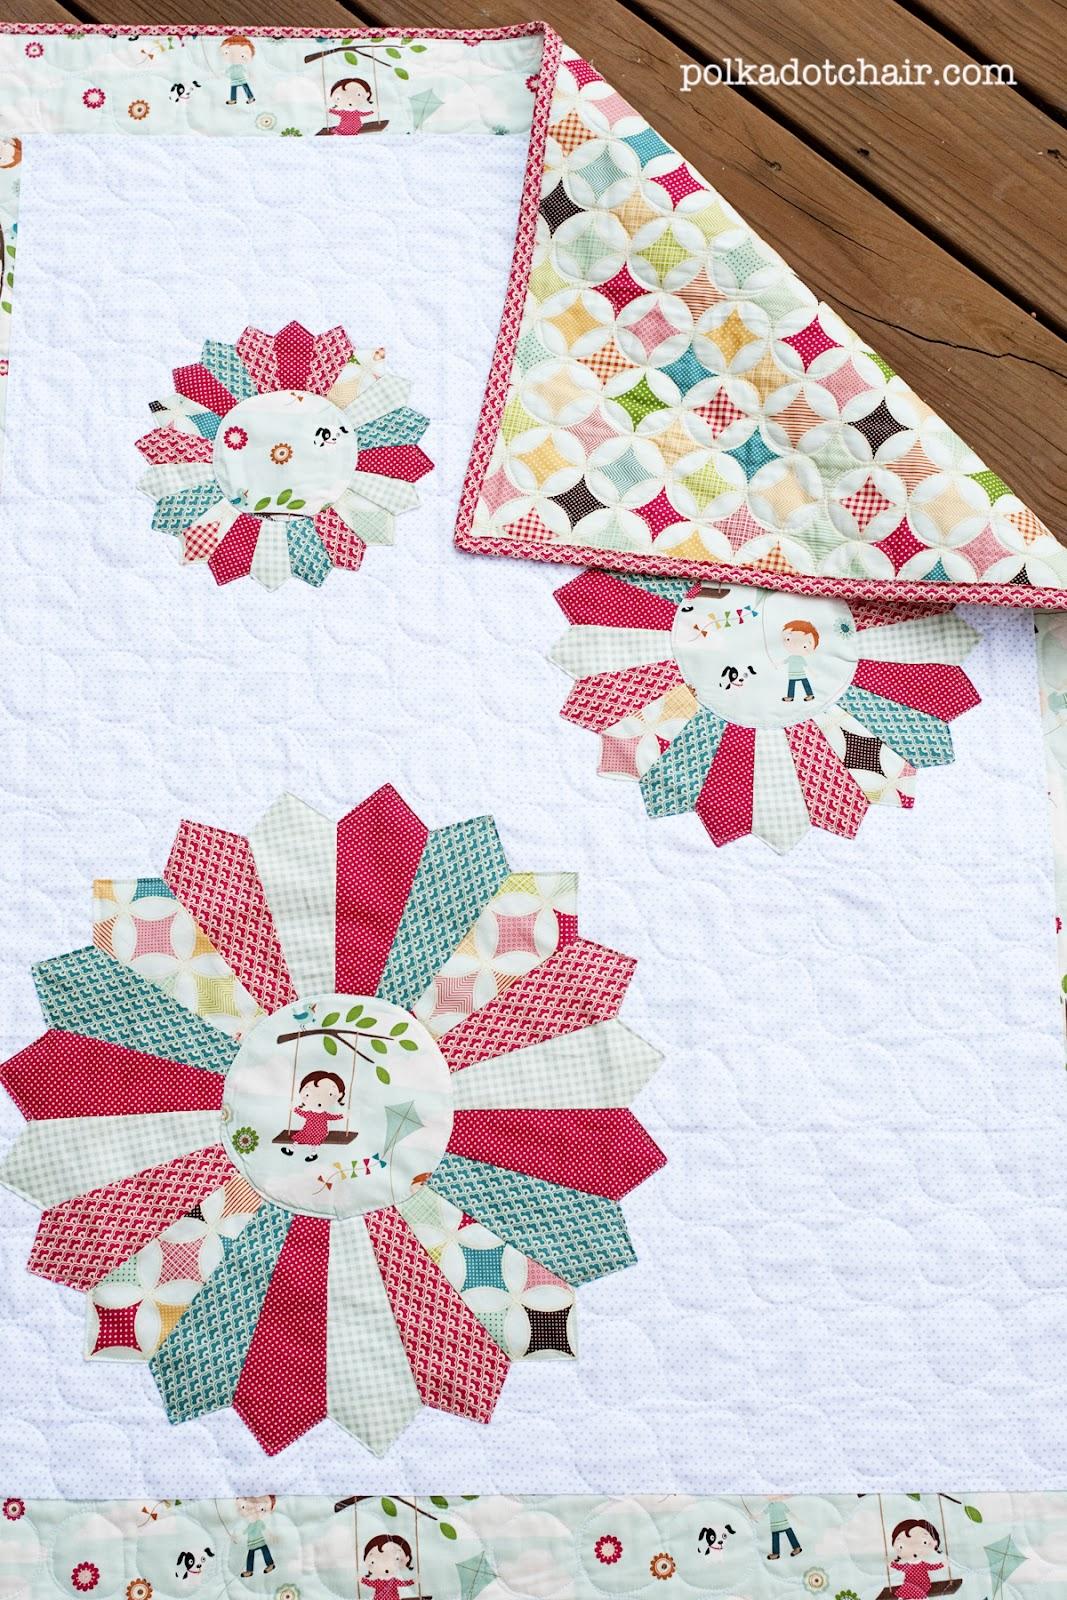 Dresden Burst Baby Quilt Pattern for Riley Blake Designs - The Polkadot Chair